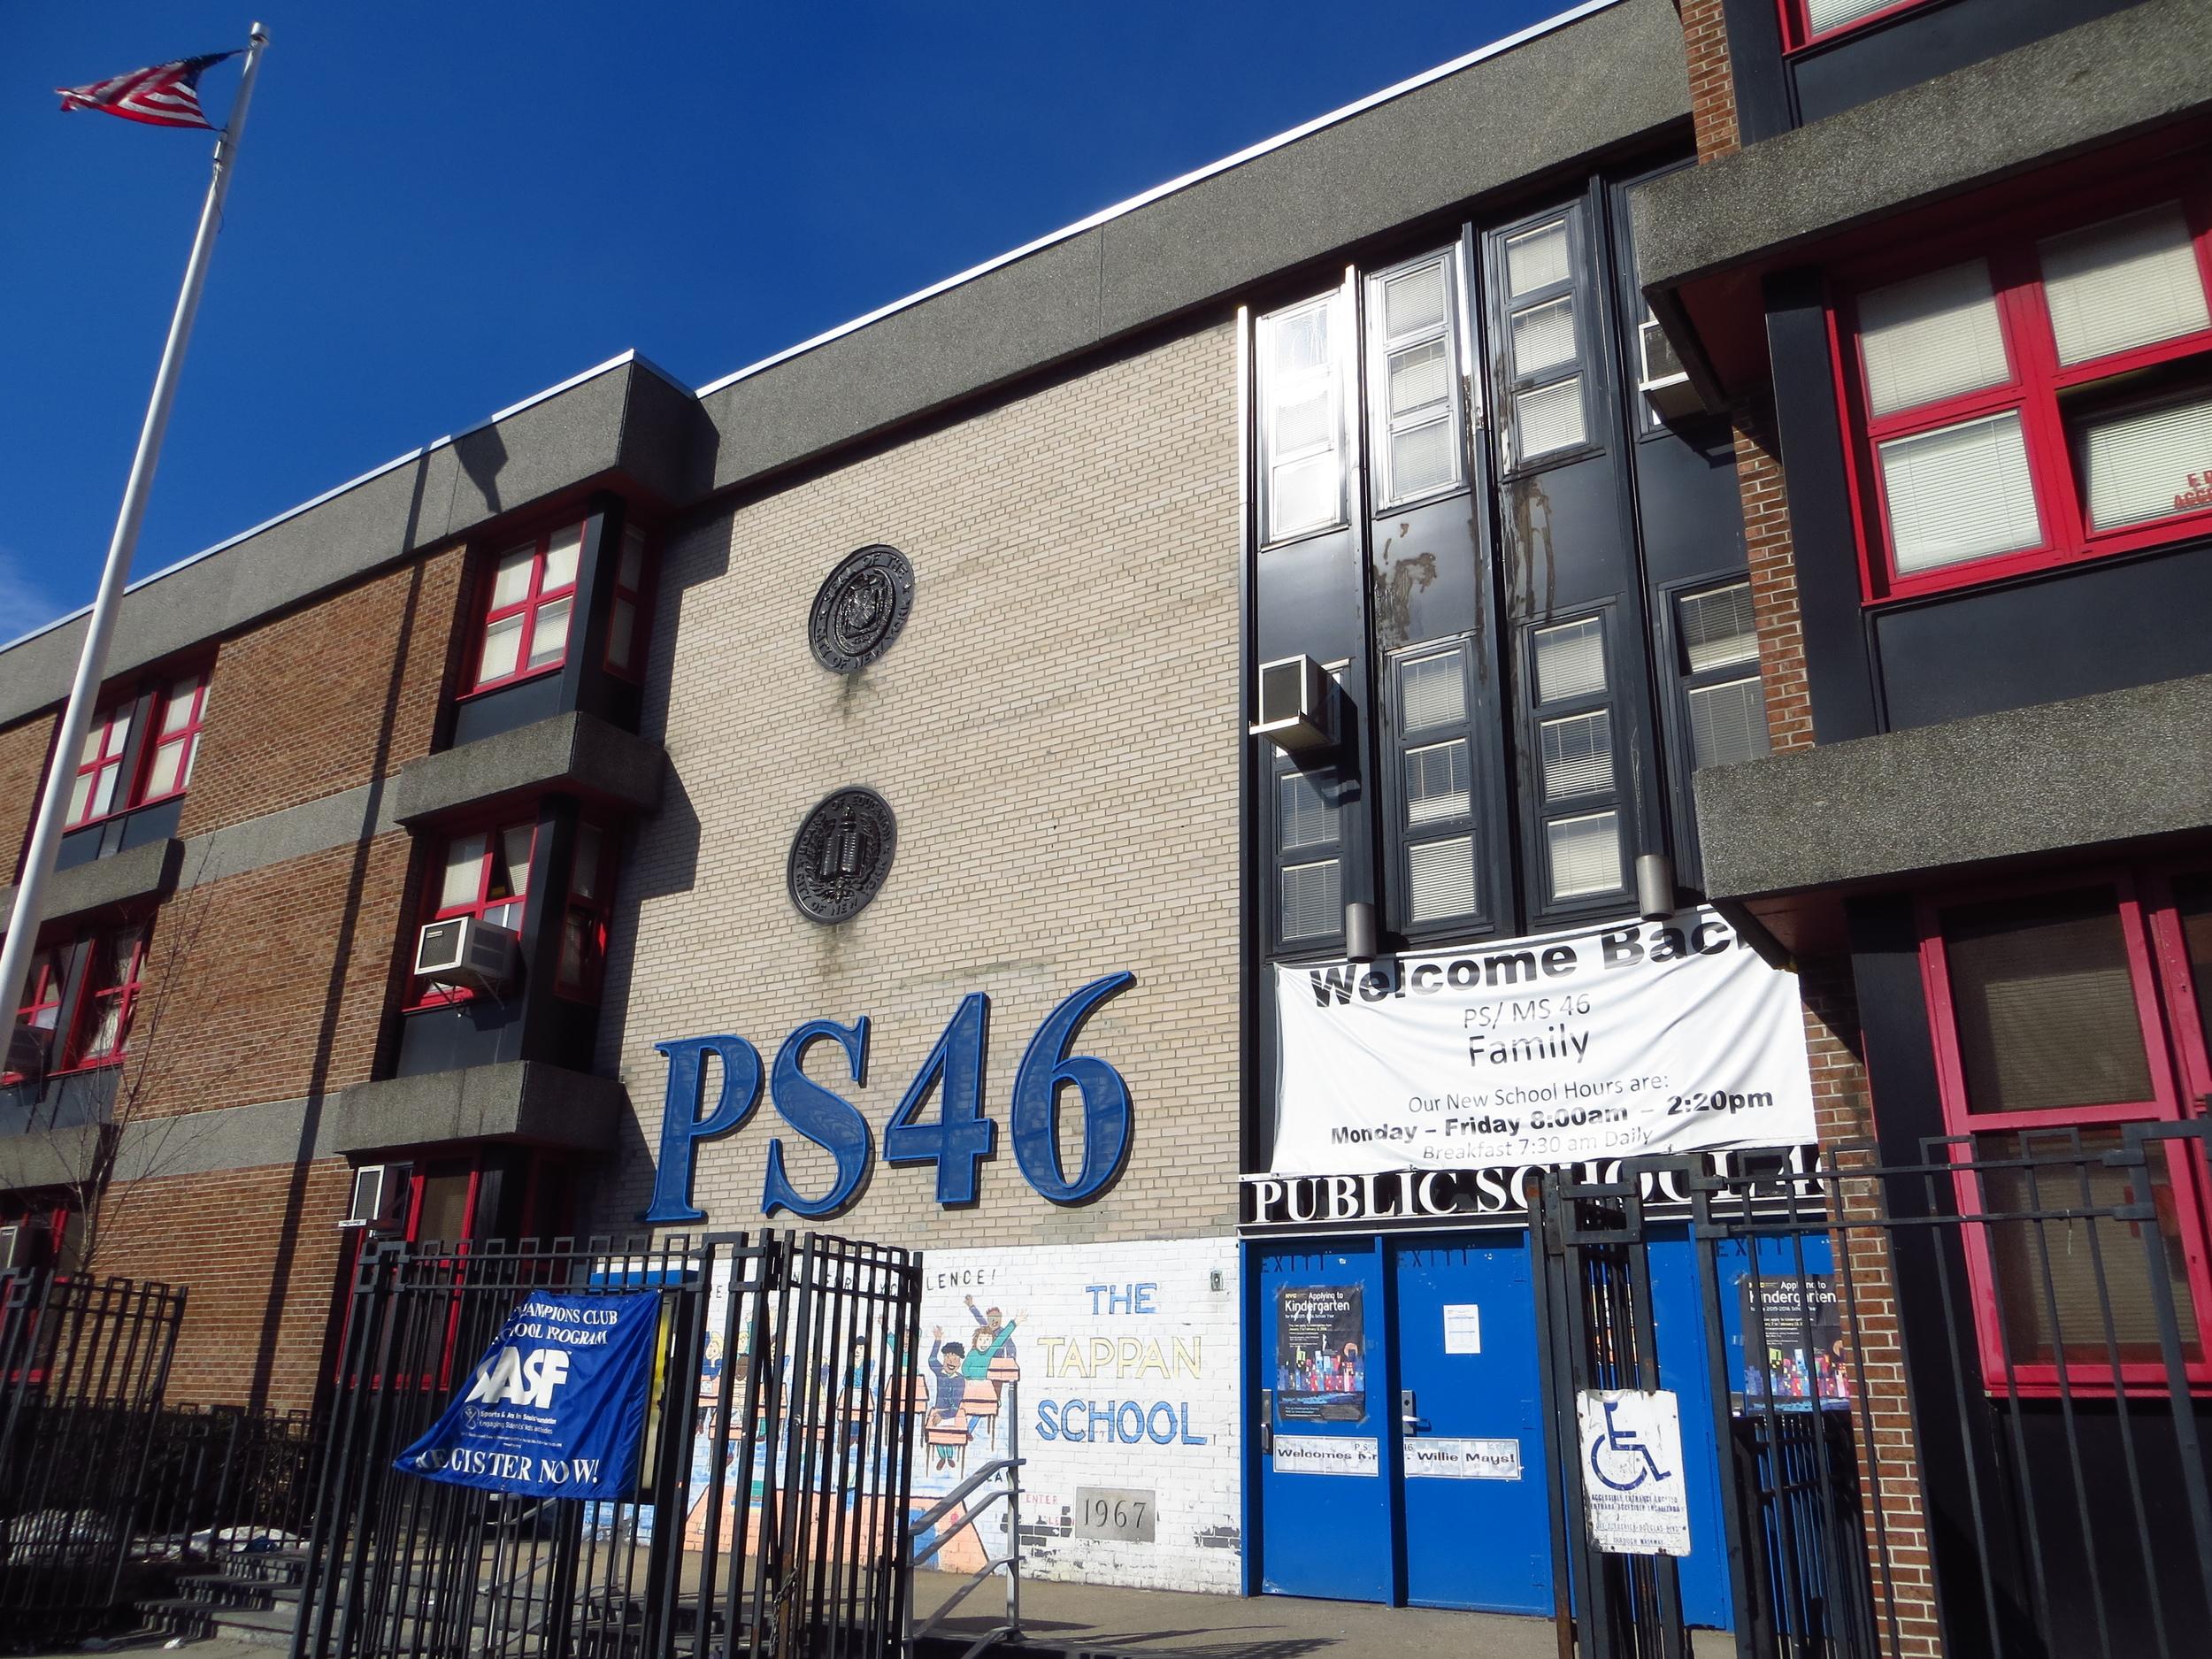 Public School 46